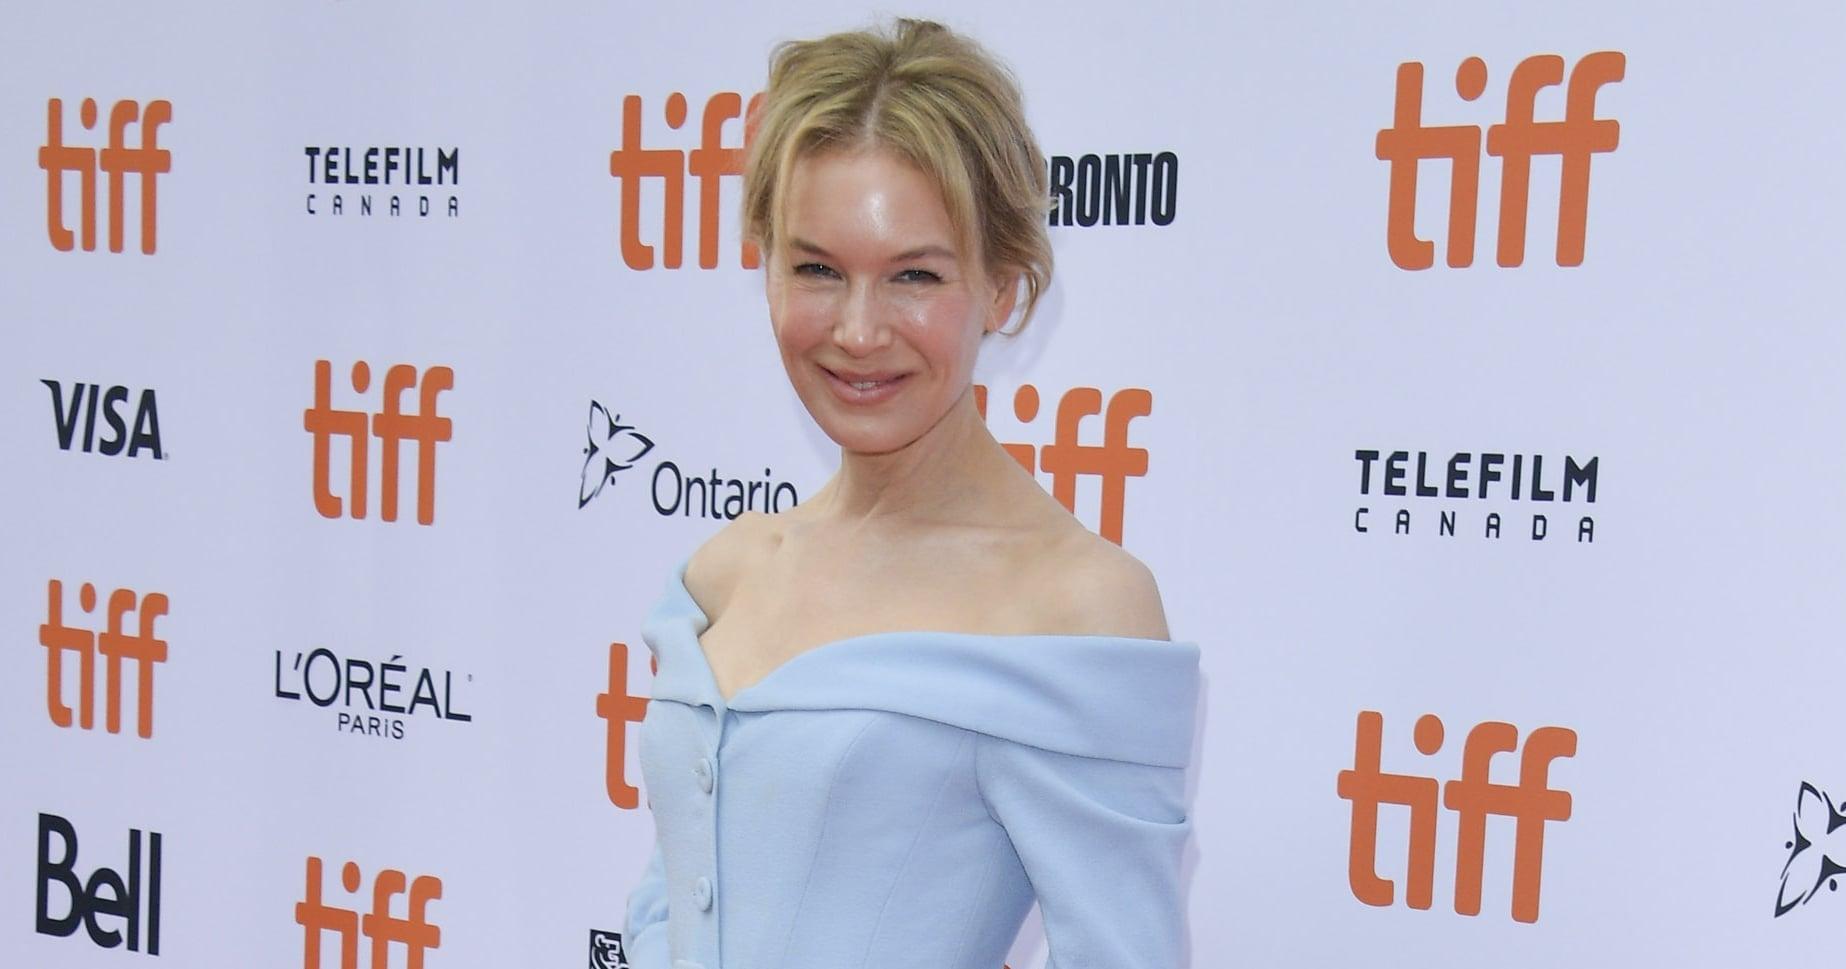 Renée Zellweger Earns 2 Standing Ovations at the Toronto Film Festival